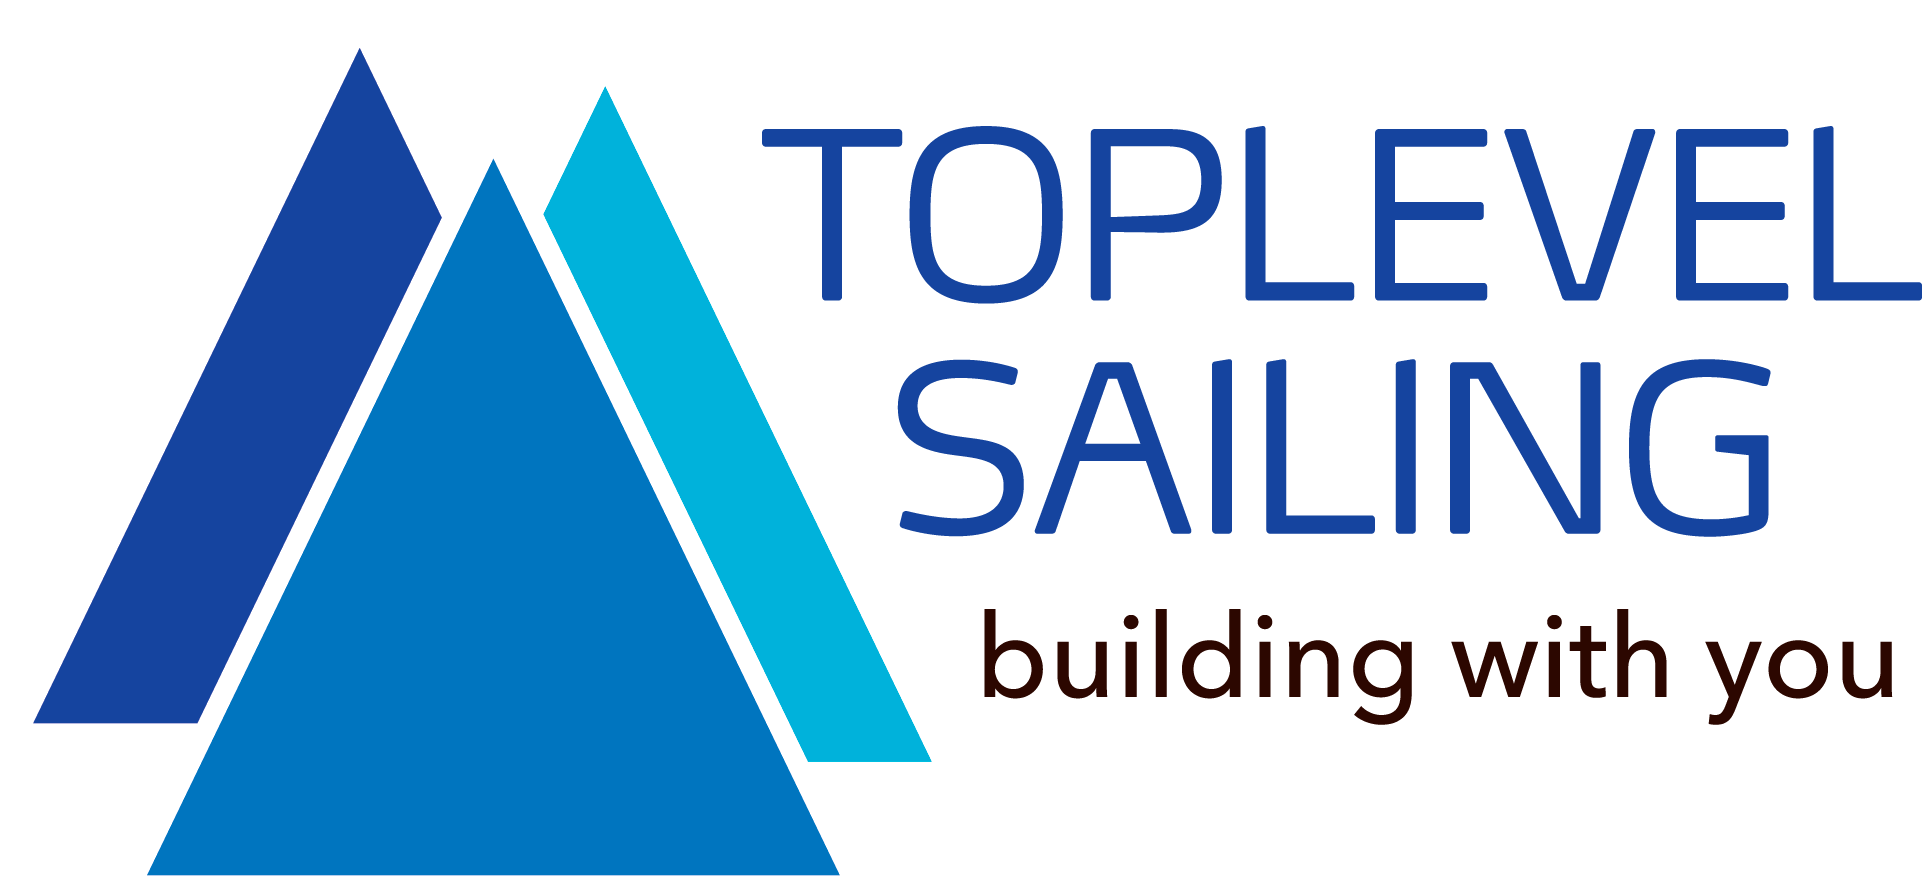 Toplevel Sailing